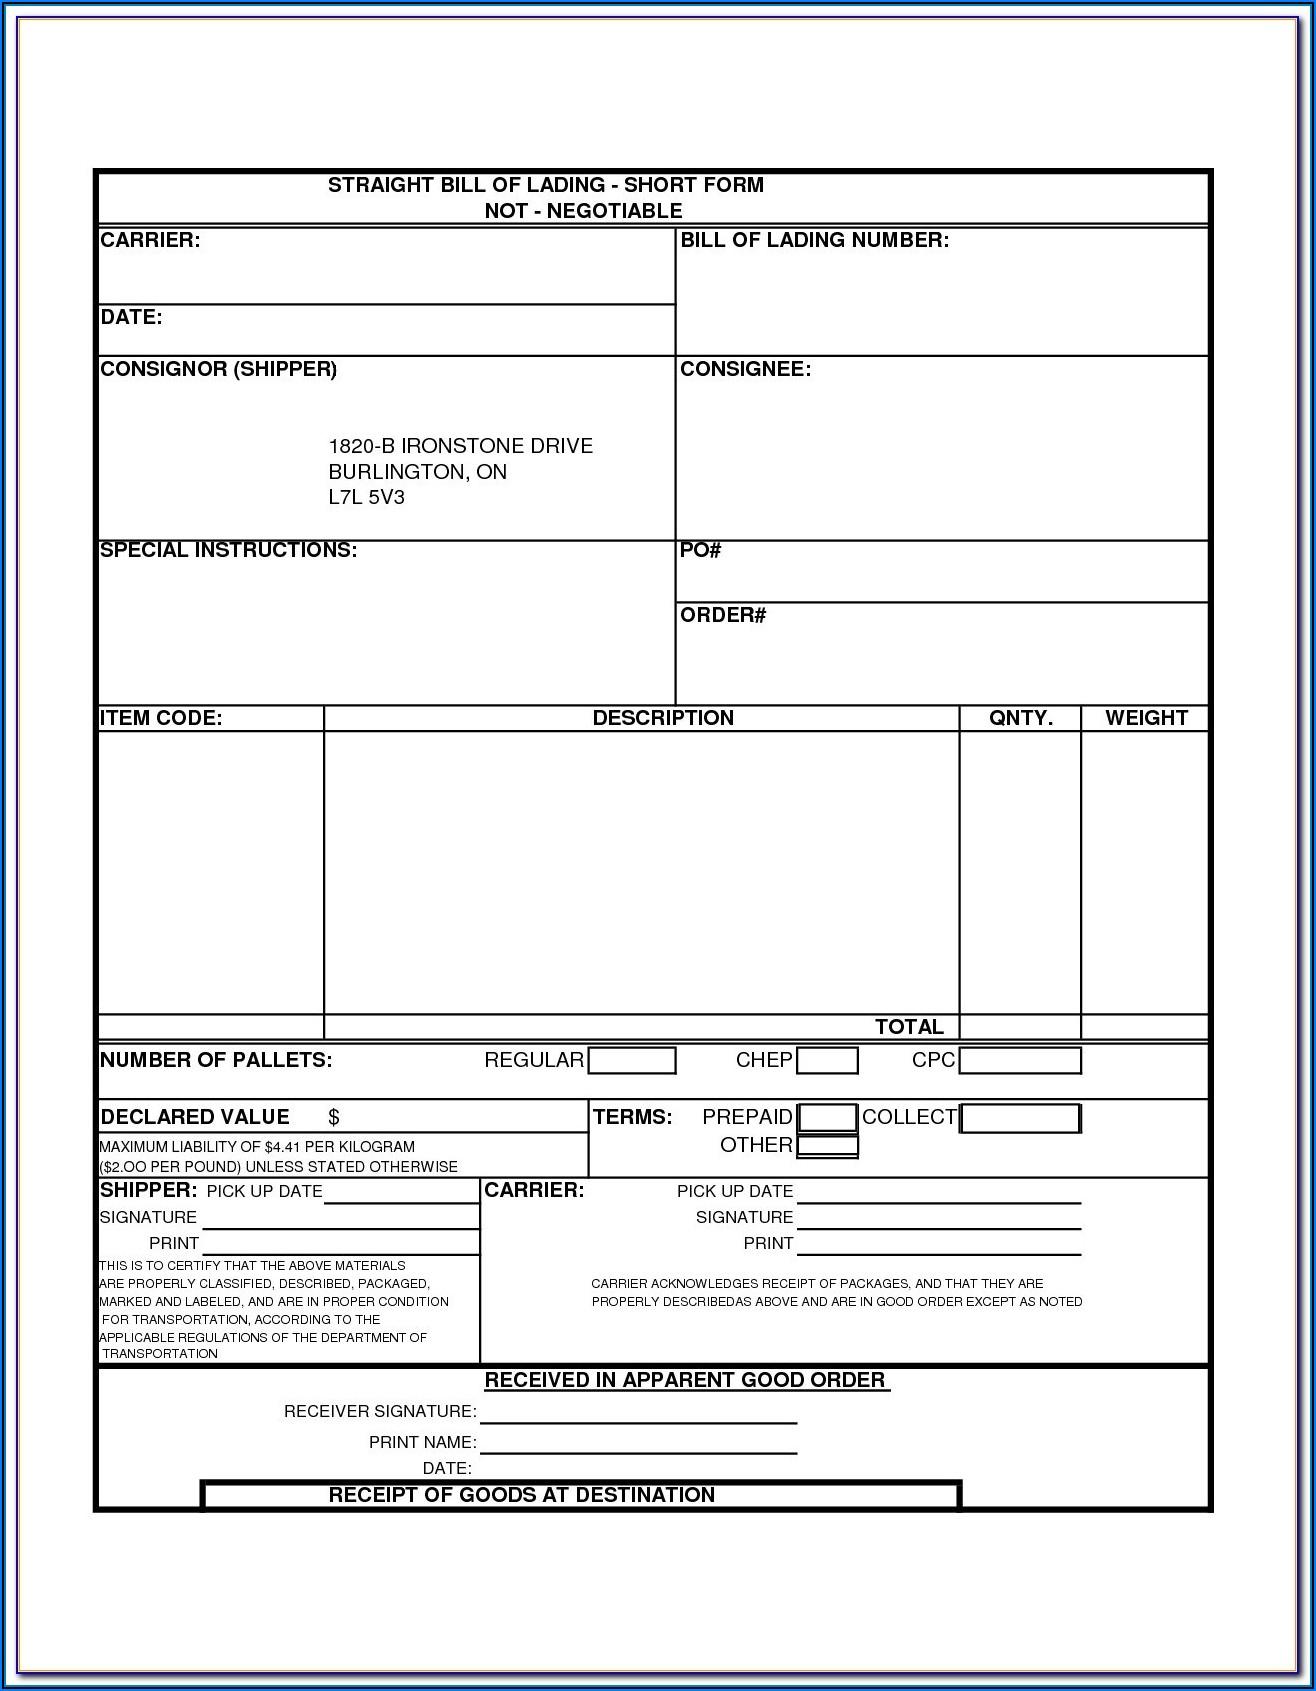 Ups Printable Bill Of Lading Form